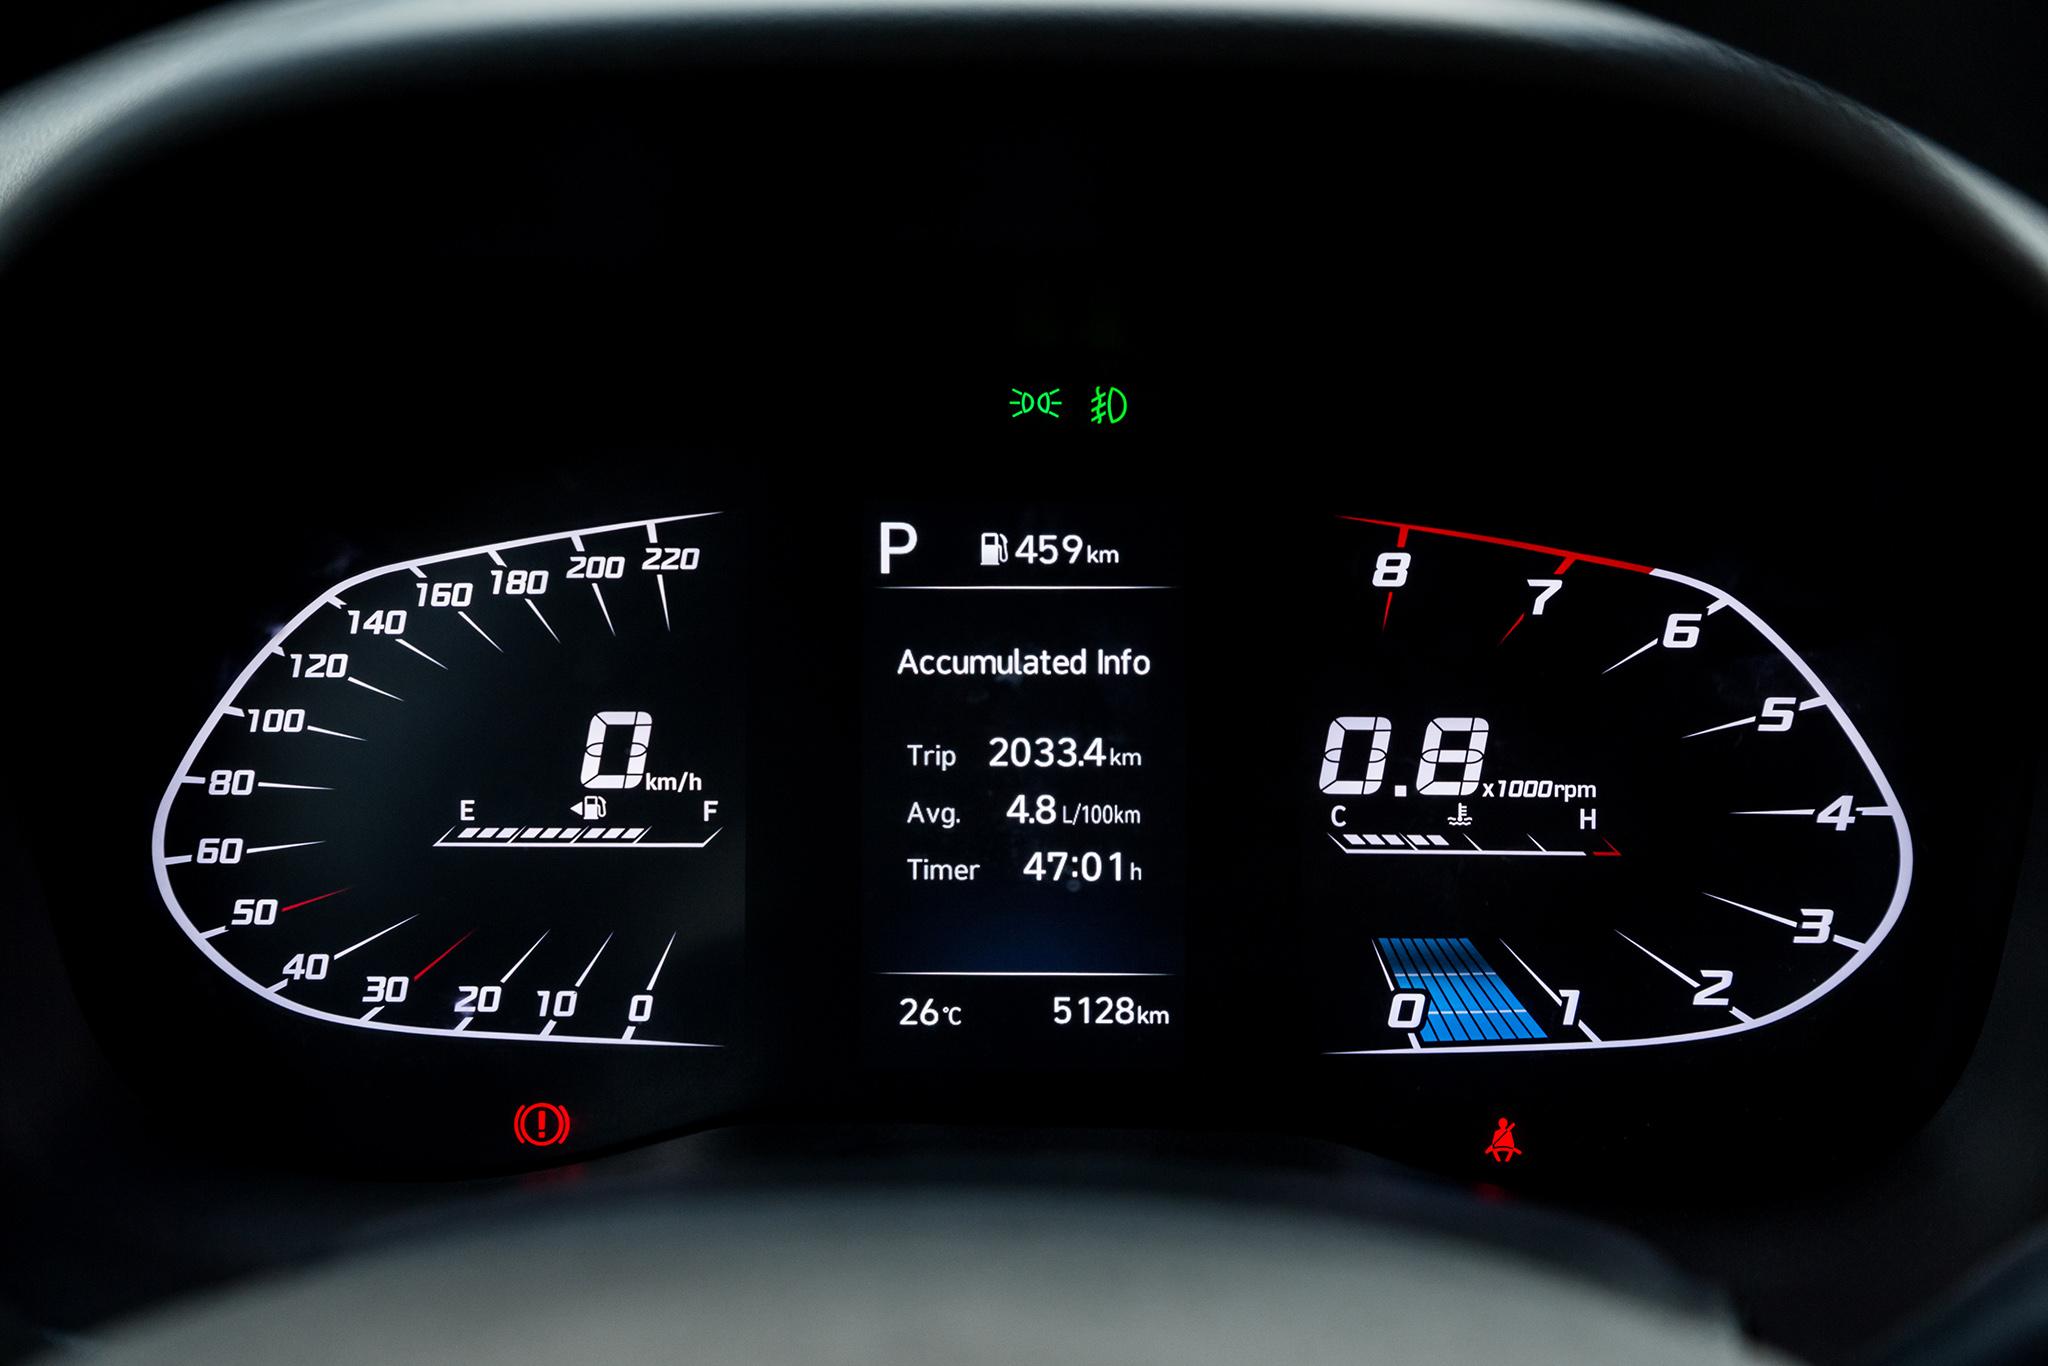 Hyundai Vinh giới thiệu Hyundai Accent 2021 giá từ 426,1 triệu đồng Hyundai-accent-2021-6